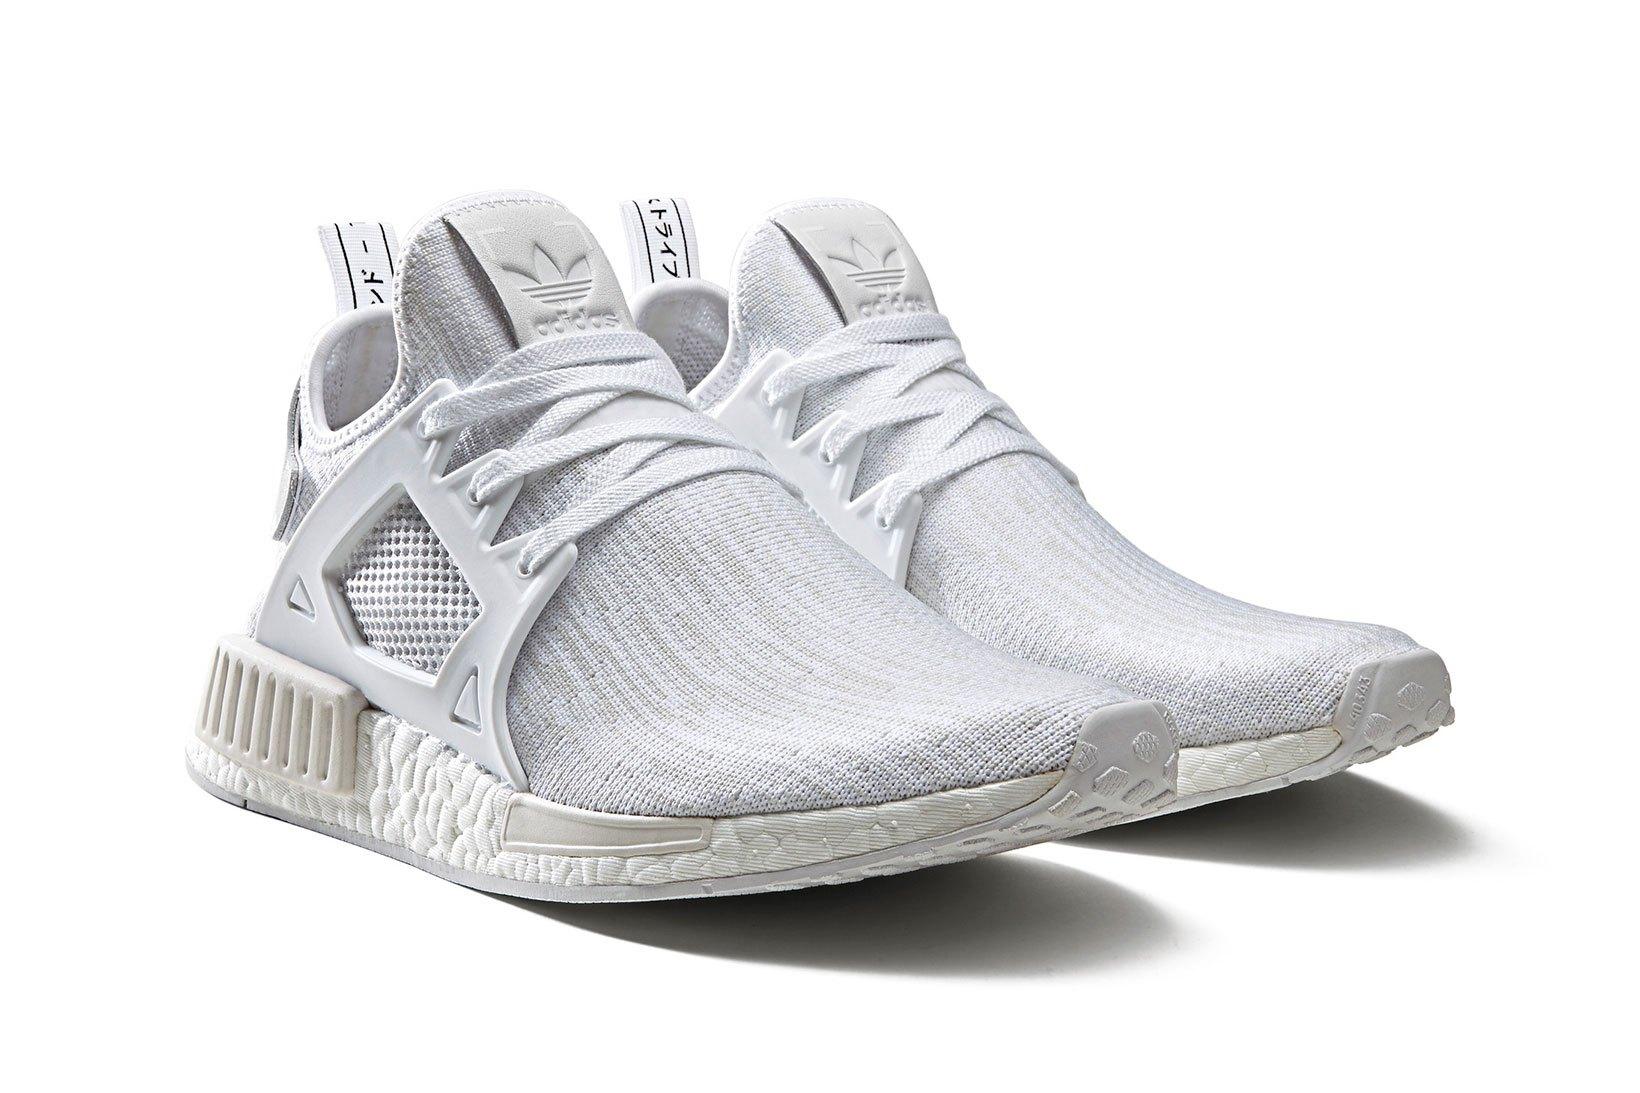 adidas nmd runner store list